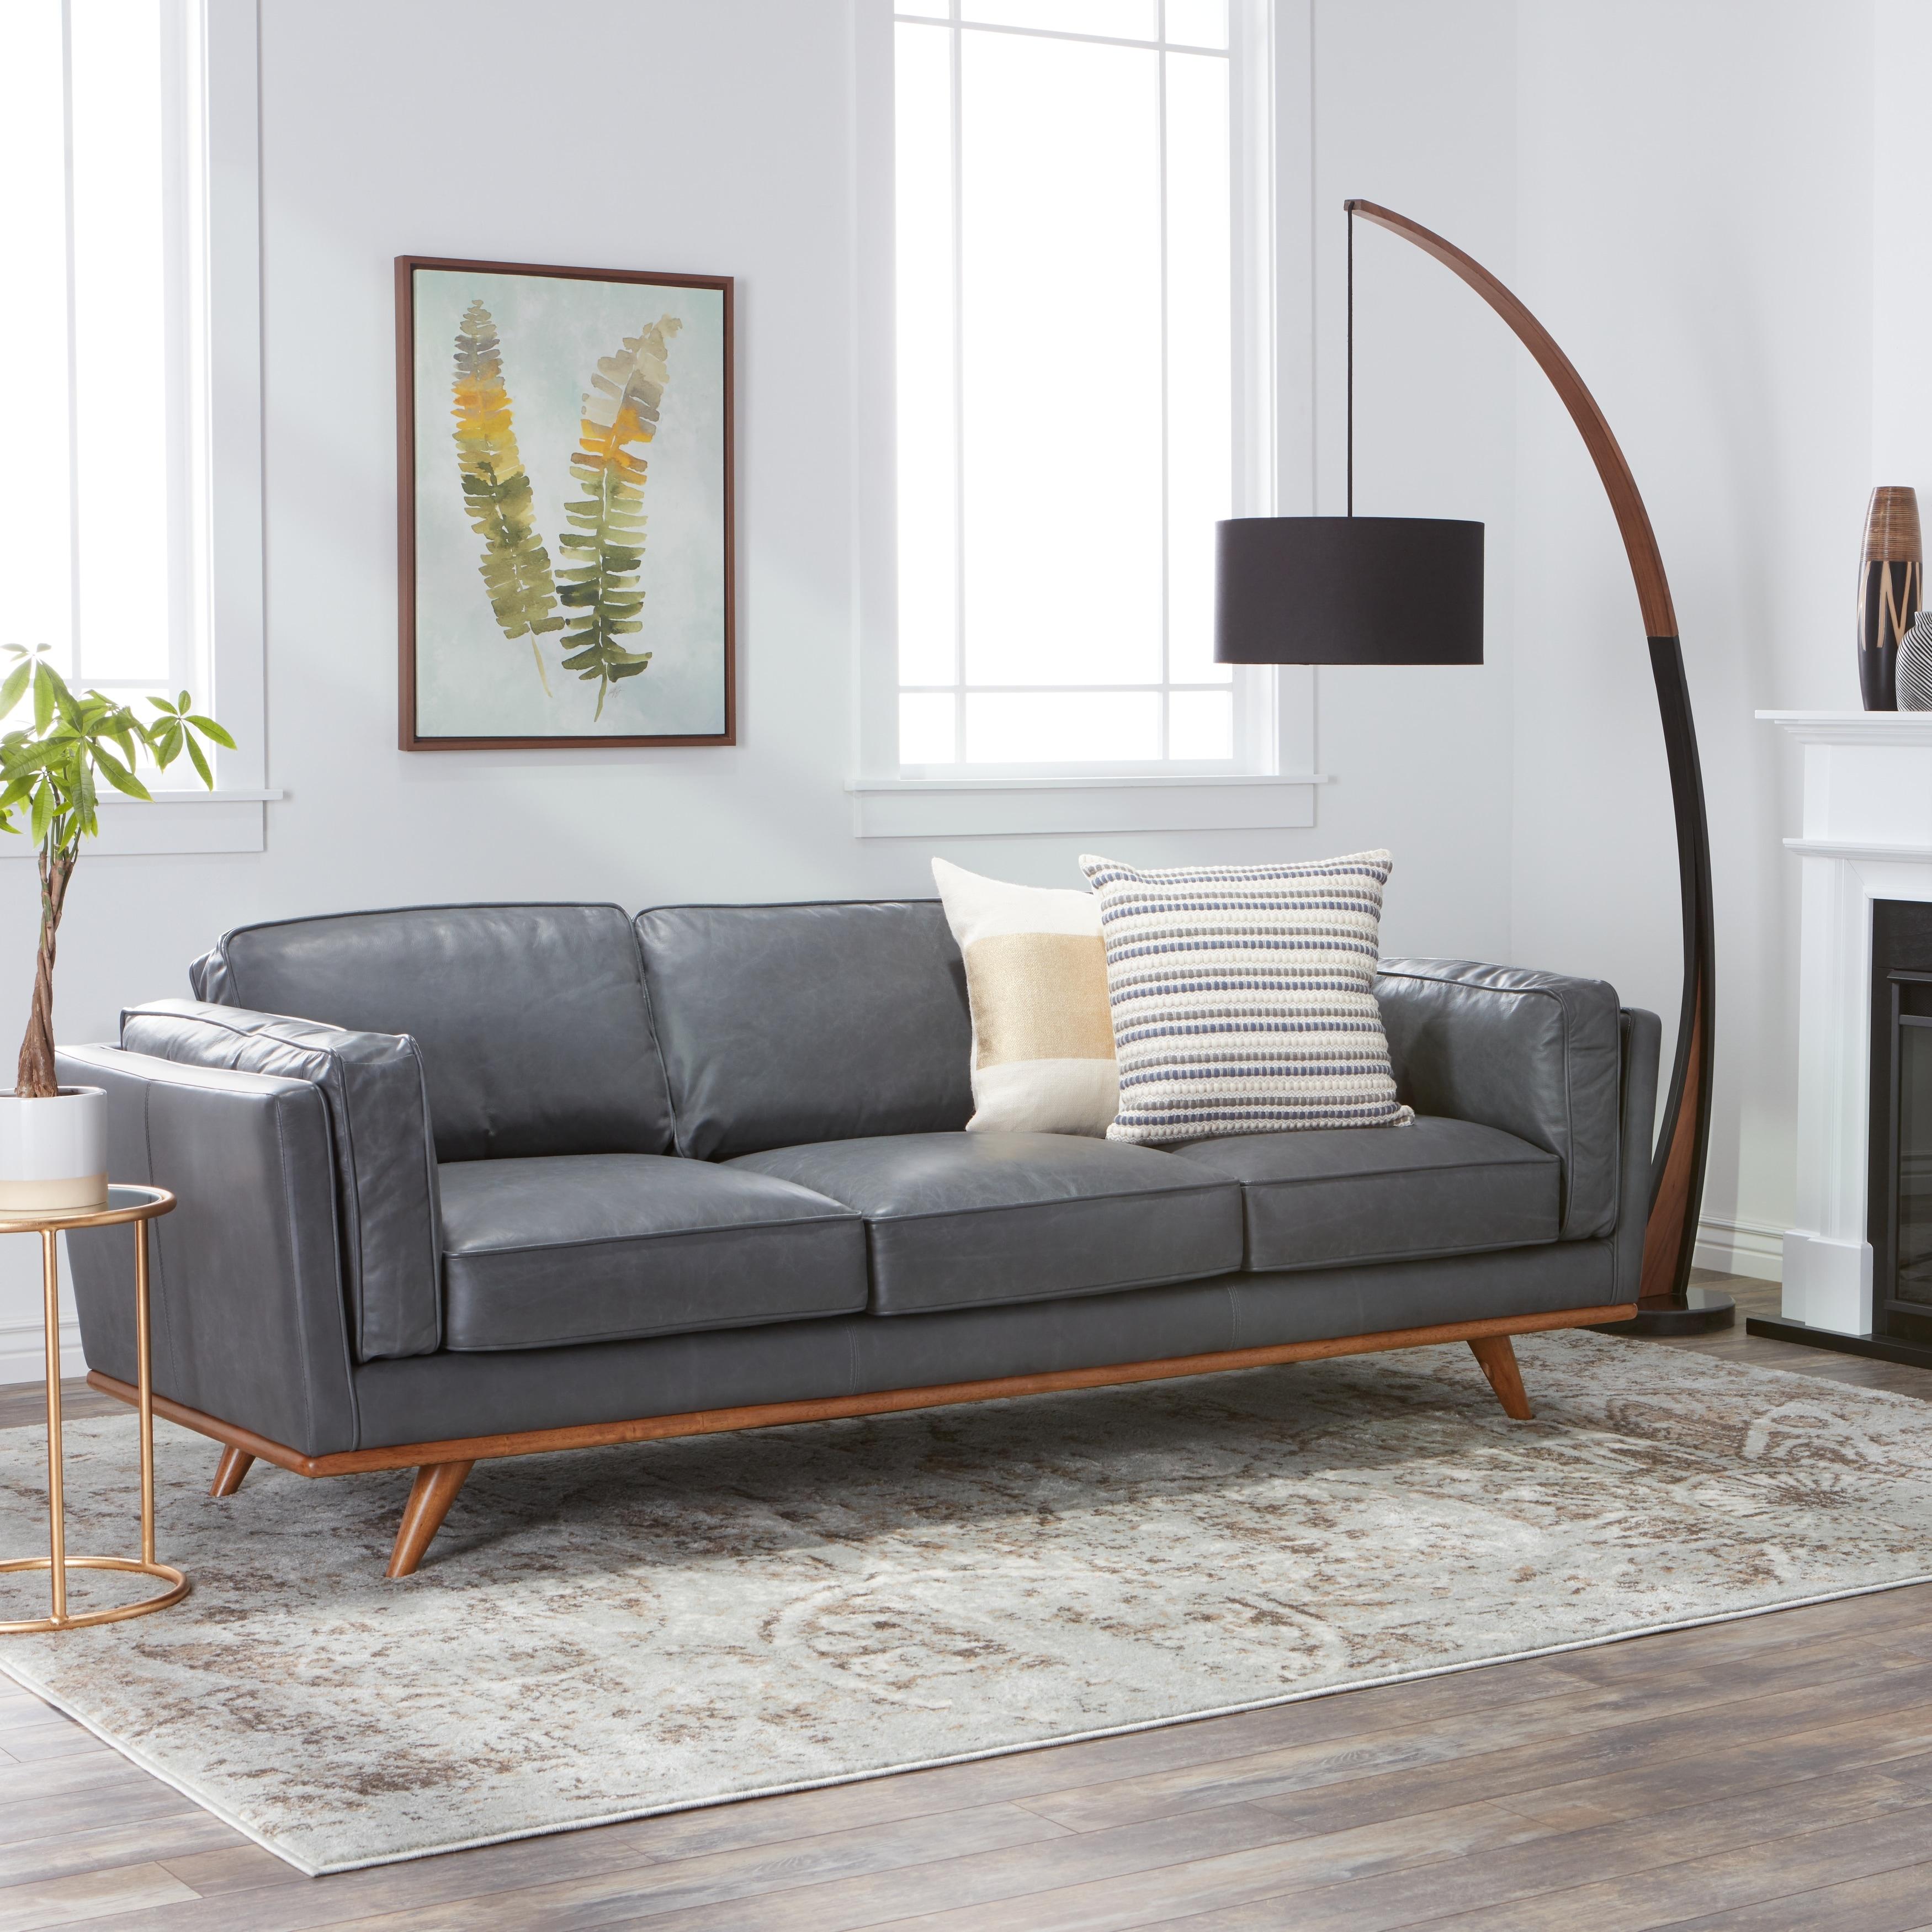 Shop Jasper Laine Del Ray Grey Oxford Leather Sofa - Free Shipping ...